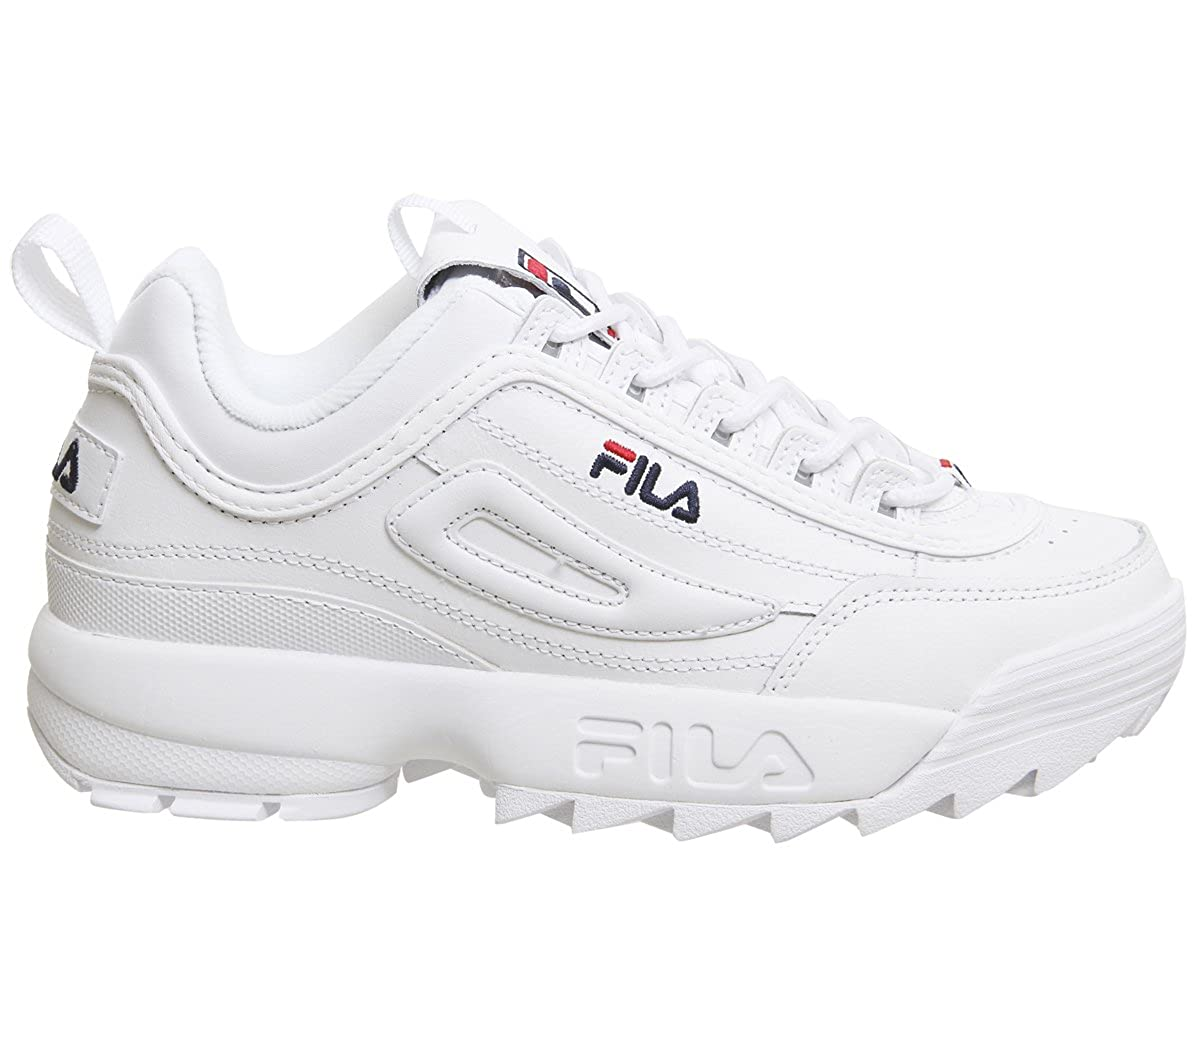 Fila Femmes Blanc Disruptor II Premium Basket